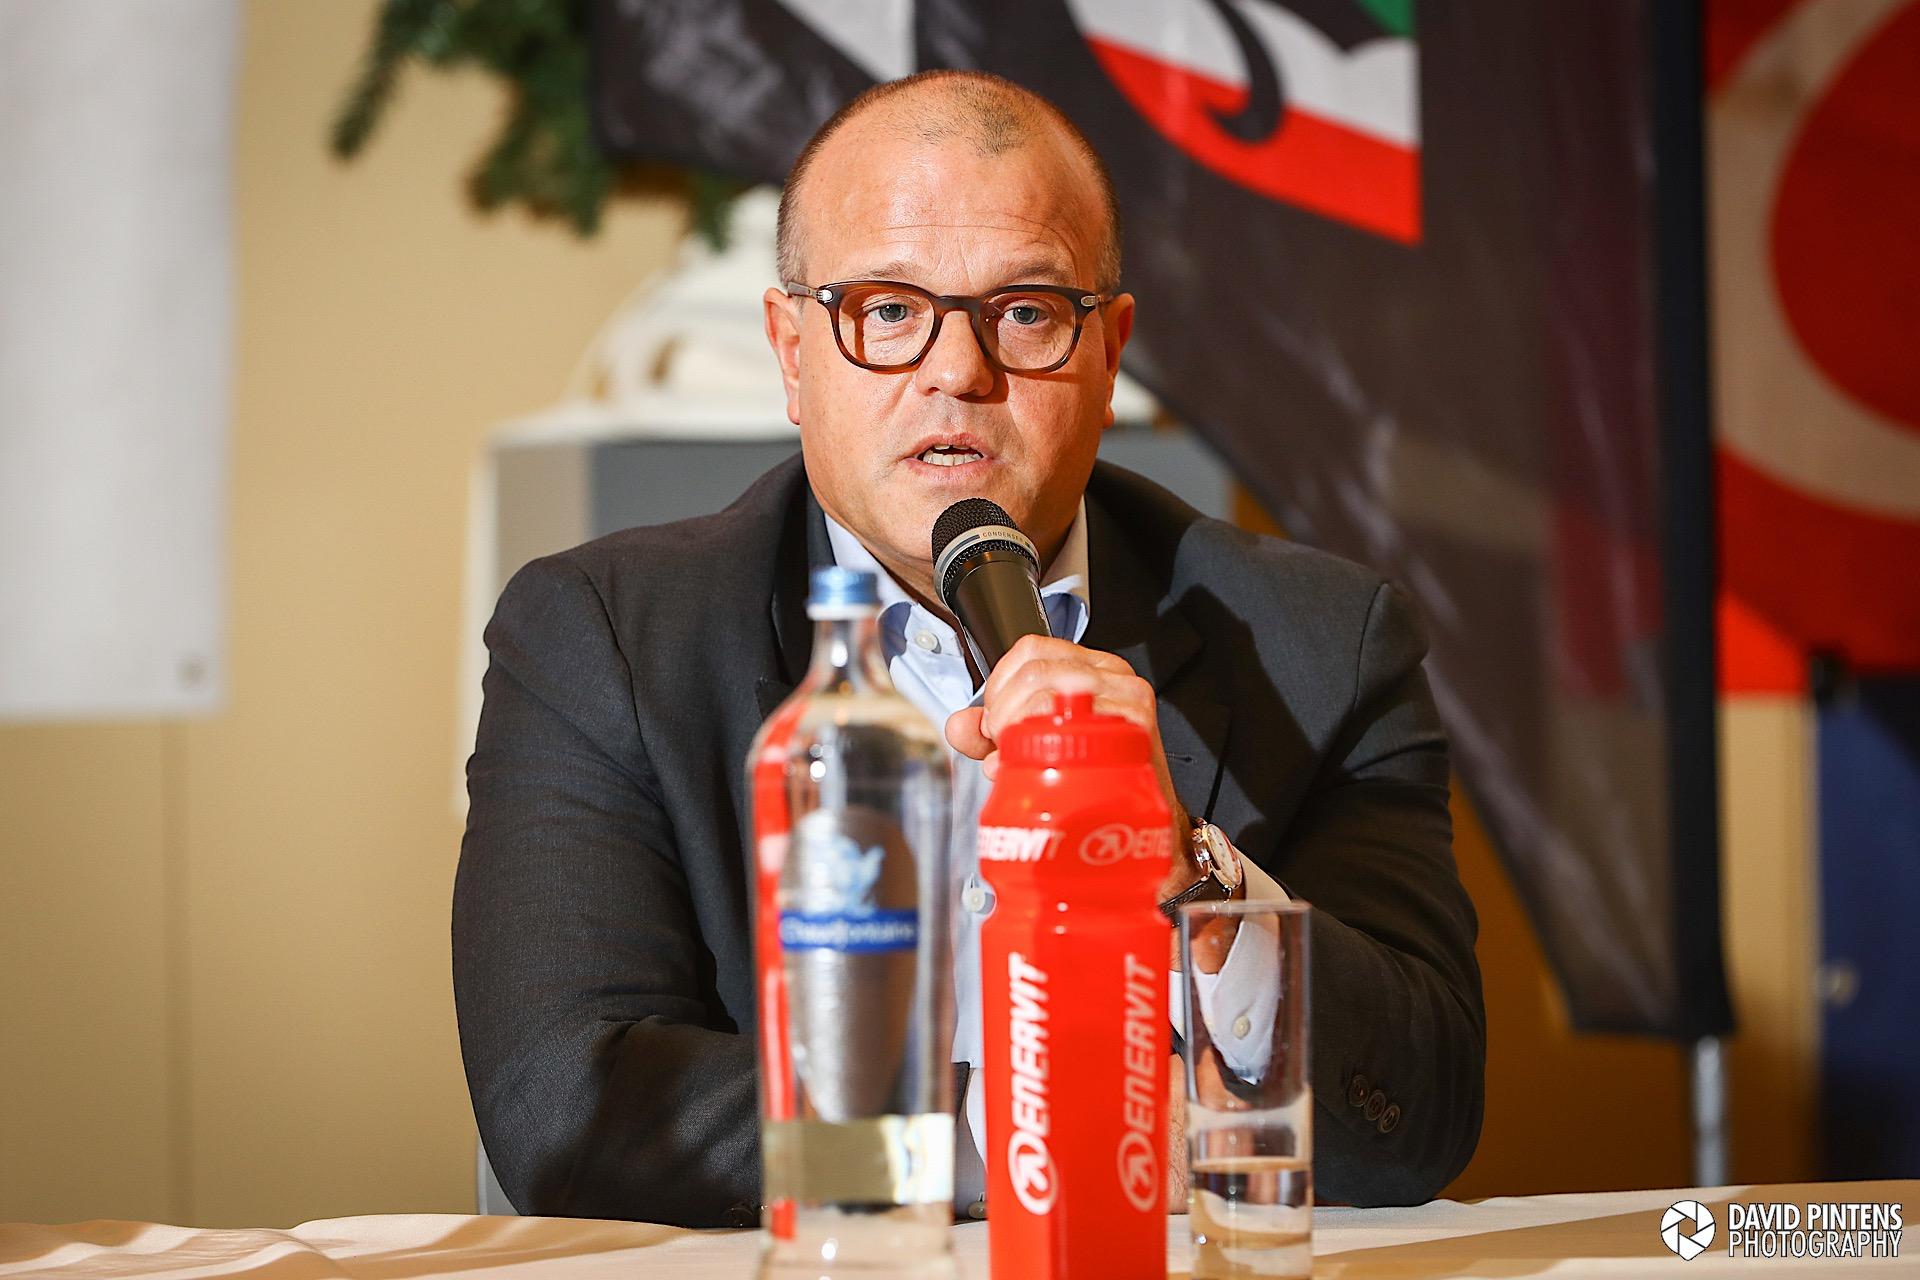 Bart Verhaeghe van Uplace (foto: David Pintens)